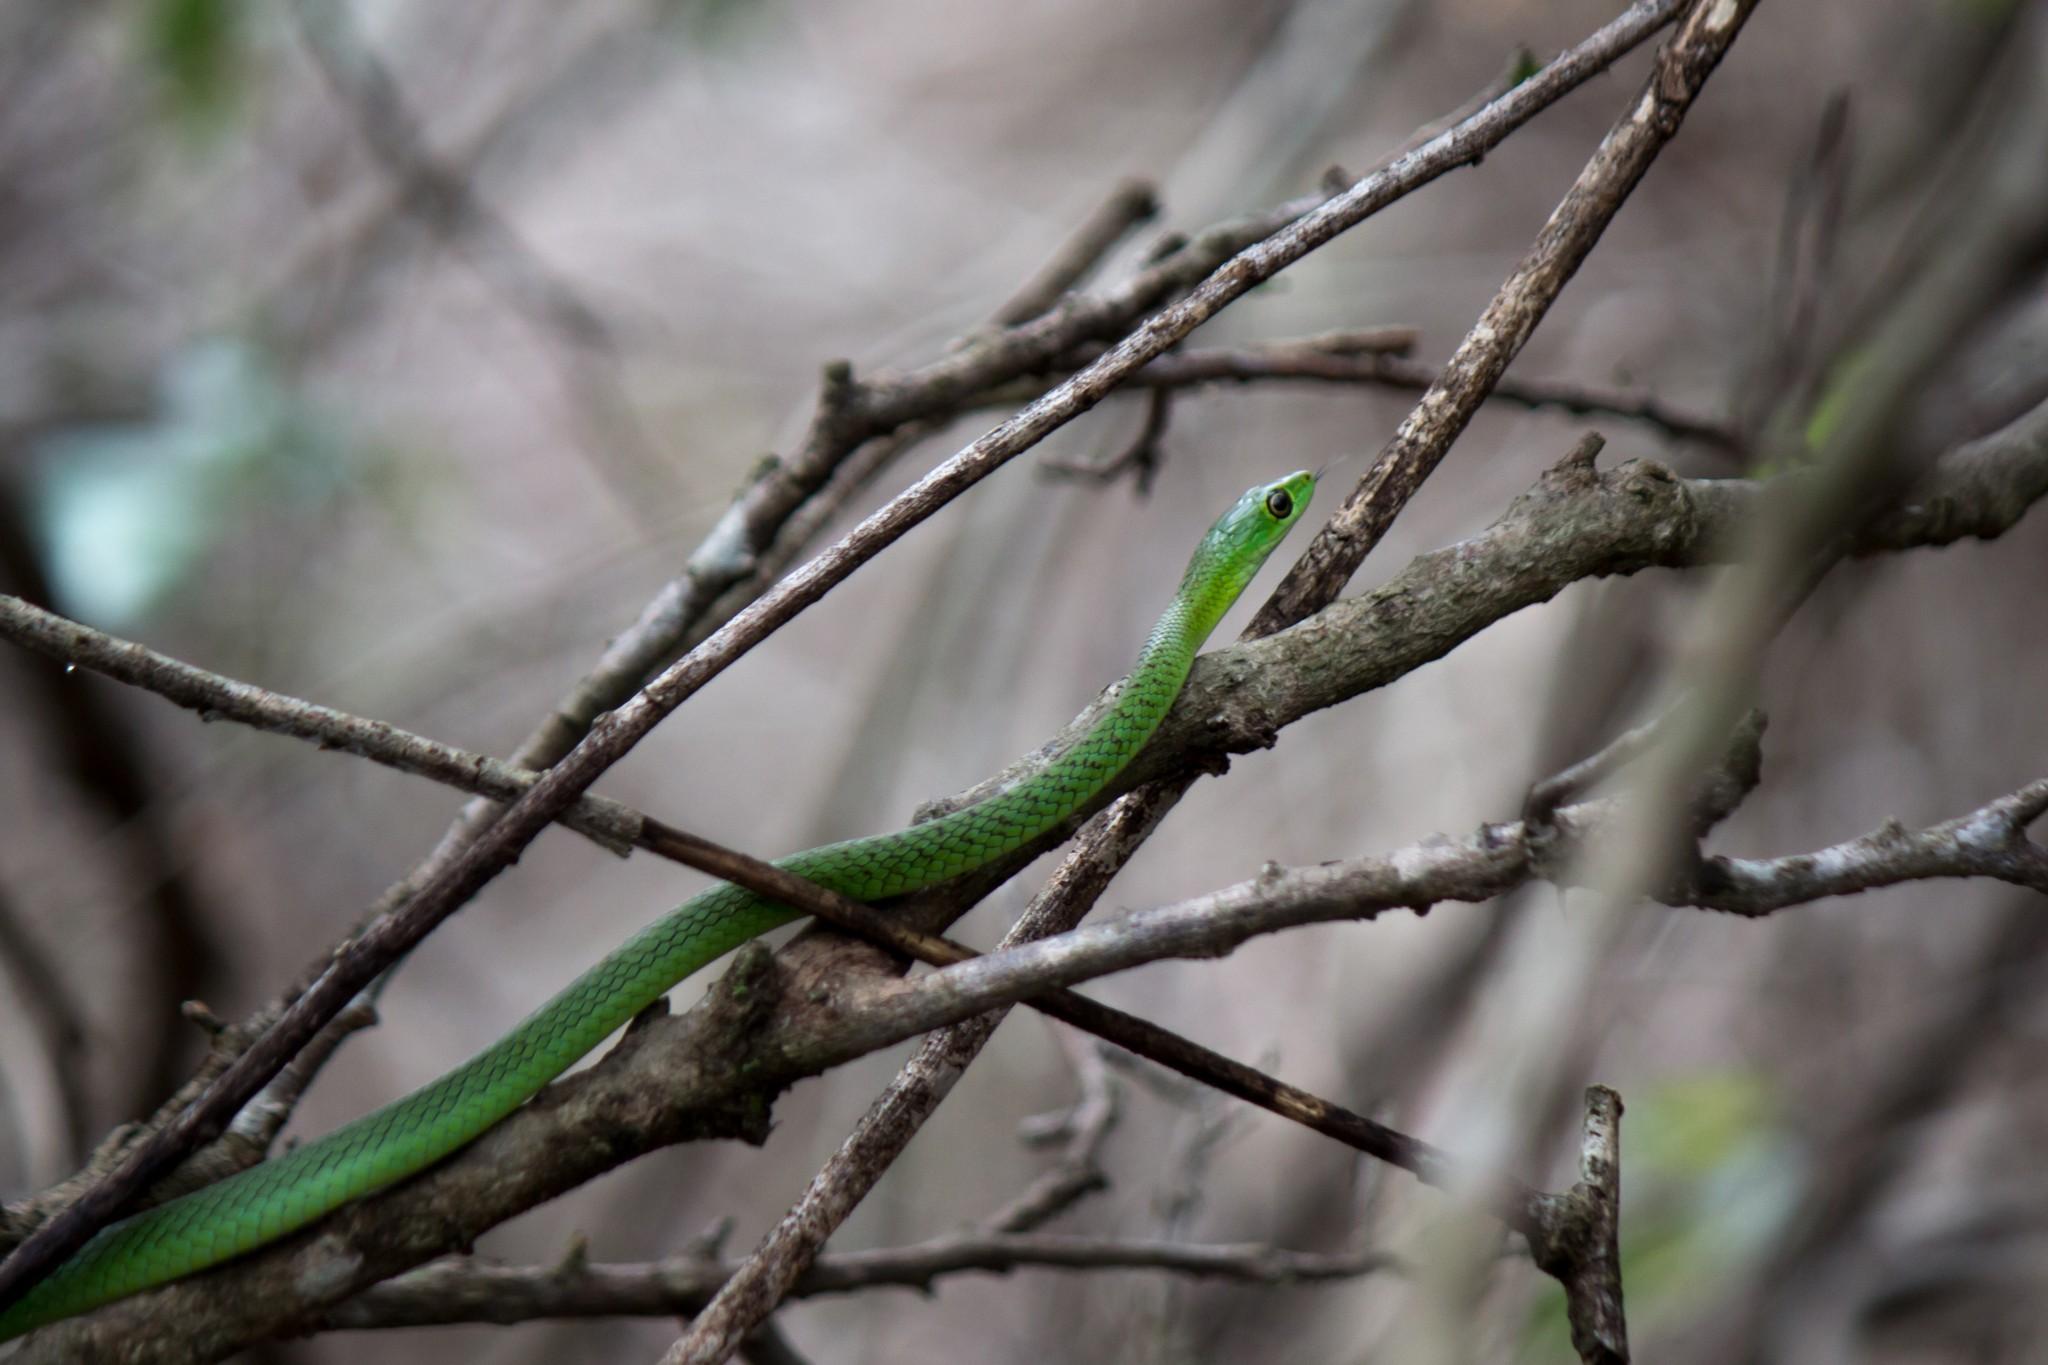 Natal Green Snake @ Tembe Elephant Park. Photo: Håvard Rosenlund